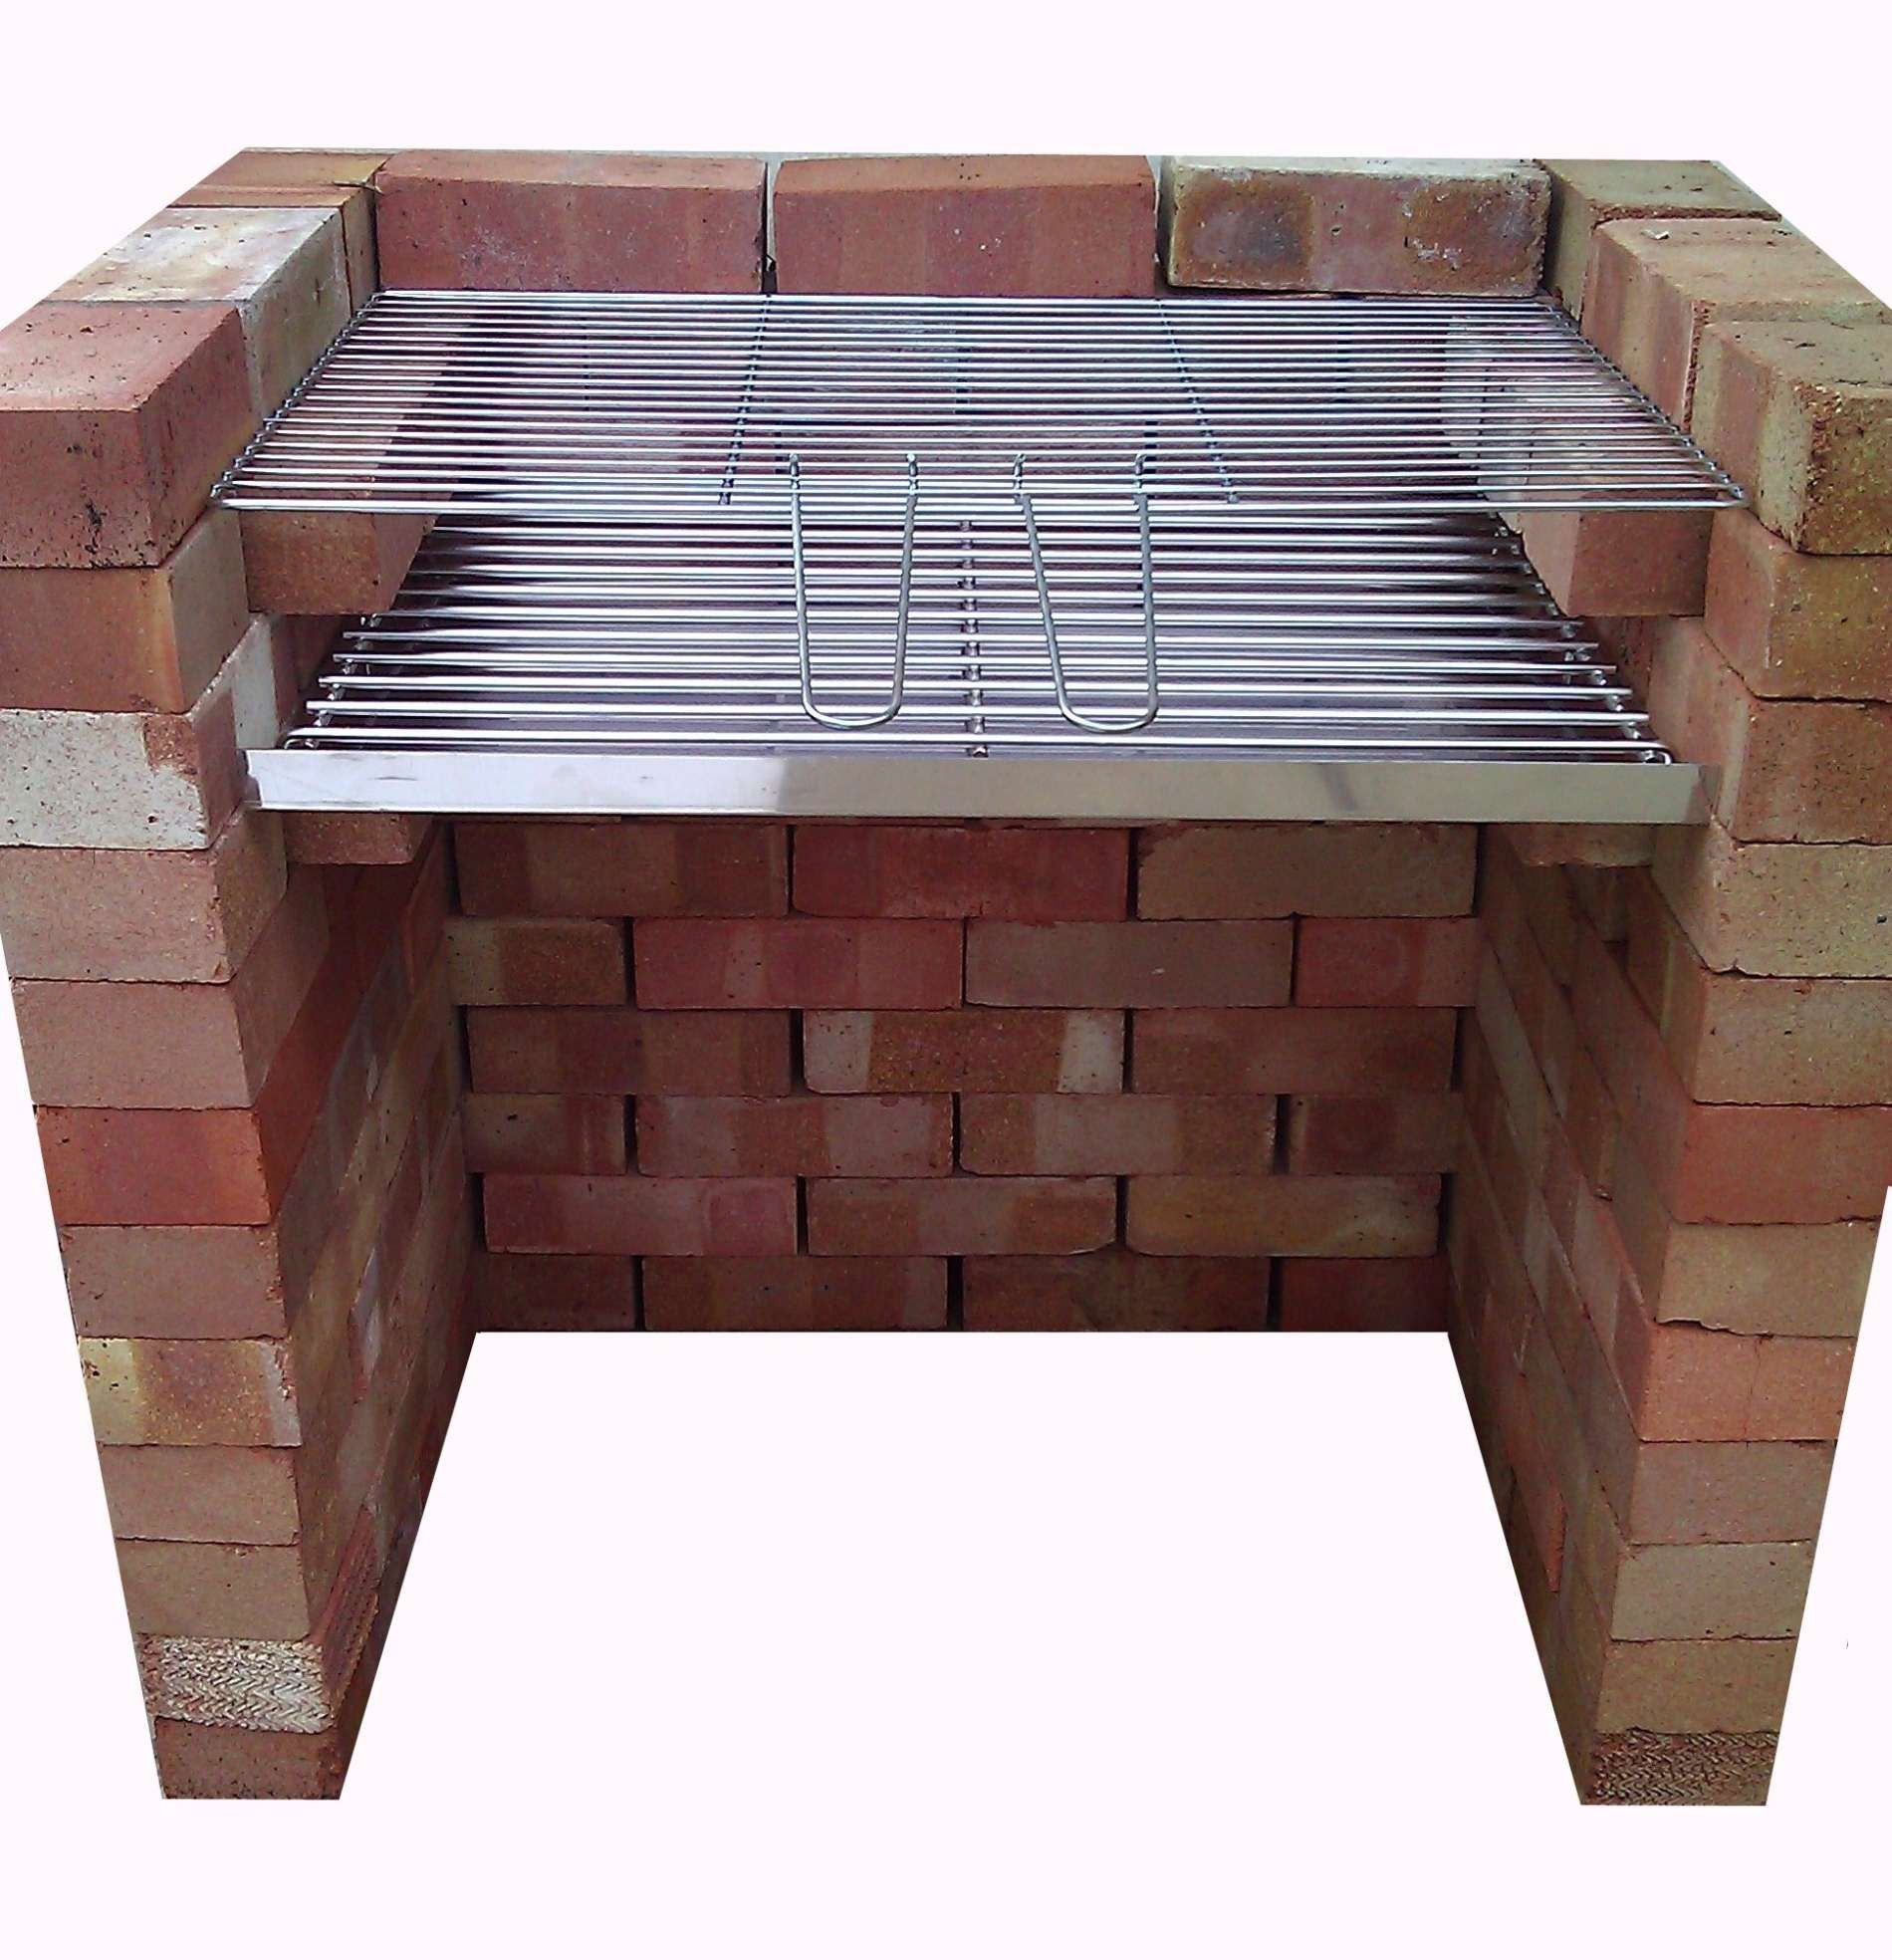 Brick Grills And Outdoor Countertops Building Your: Grill Selber Bauen, Pizzaofen, Grillplatz